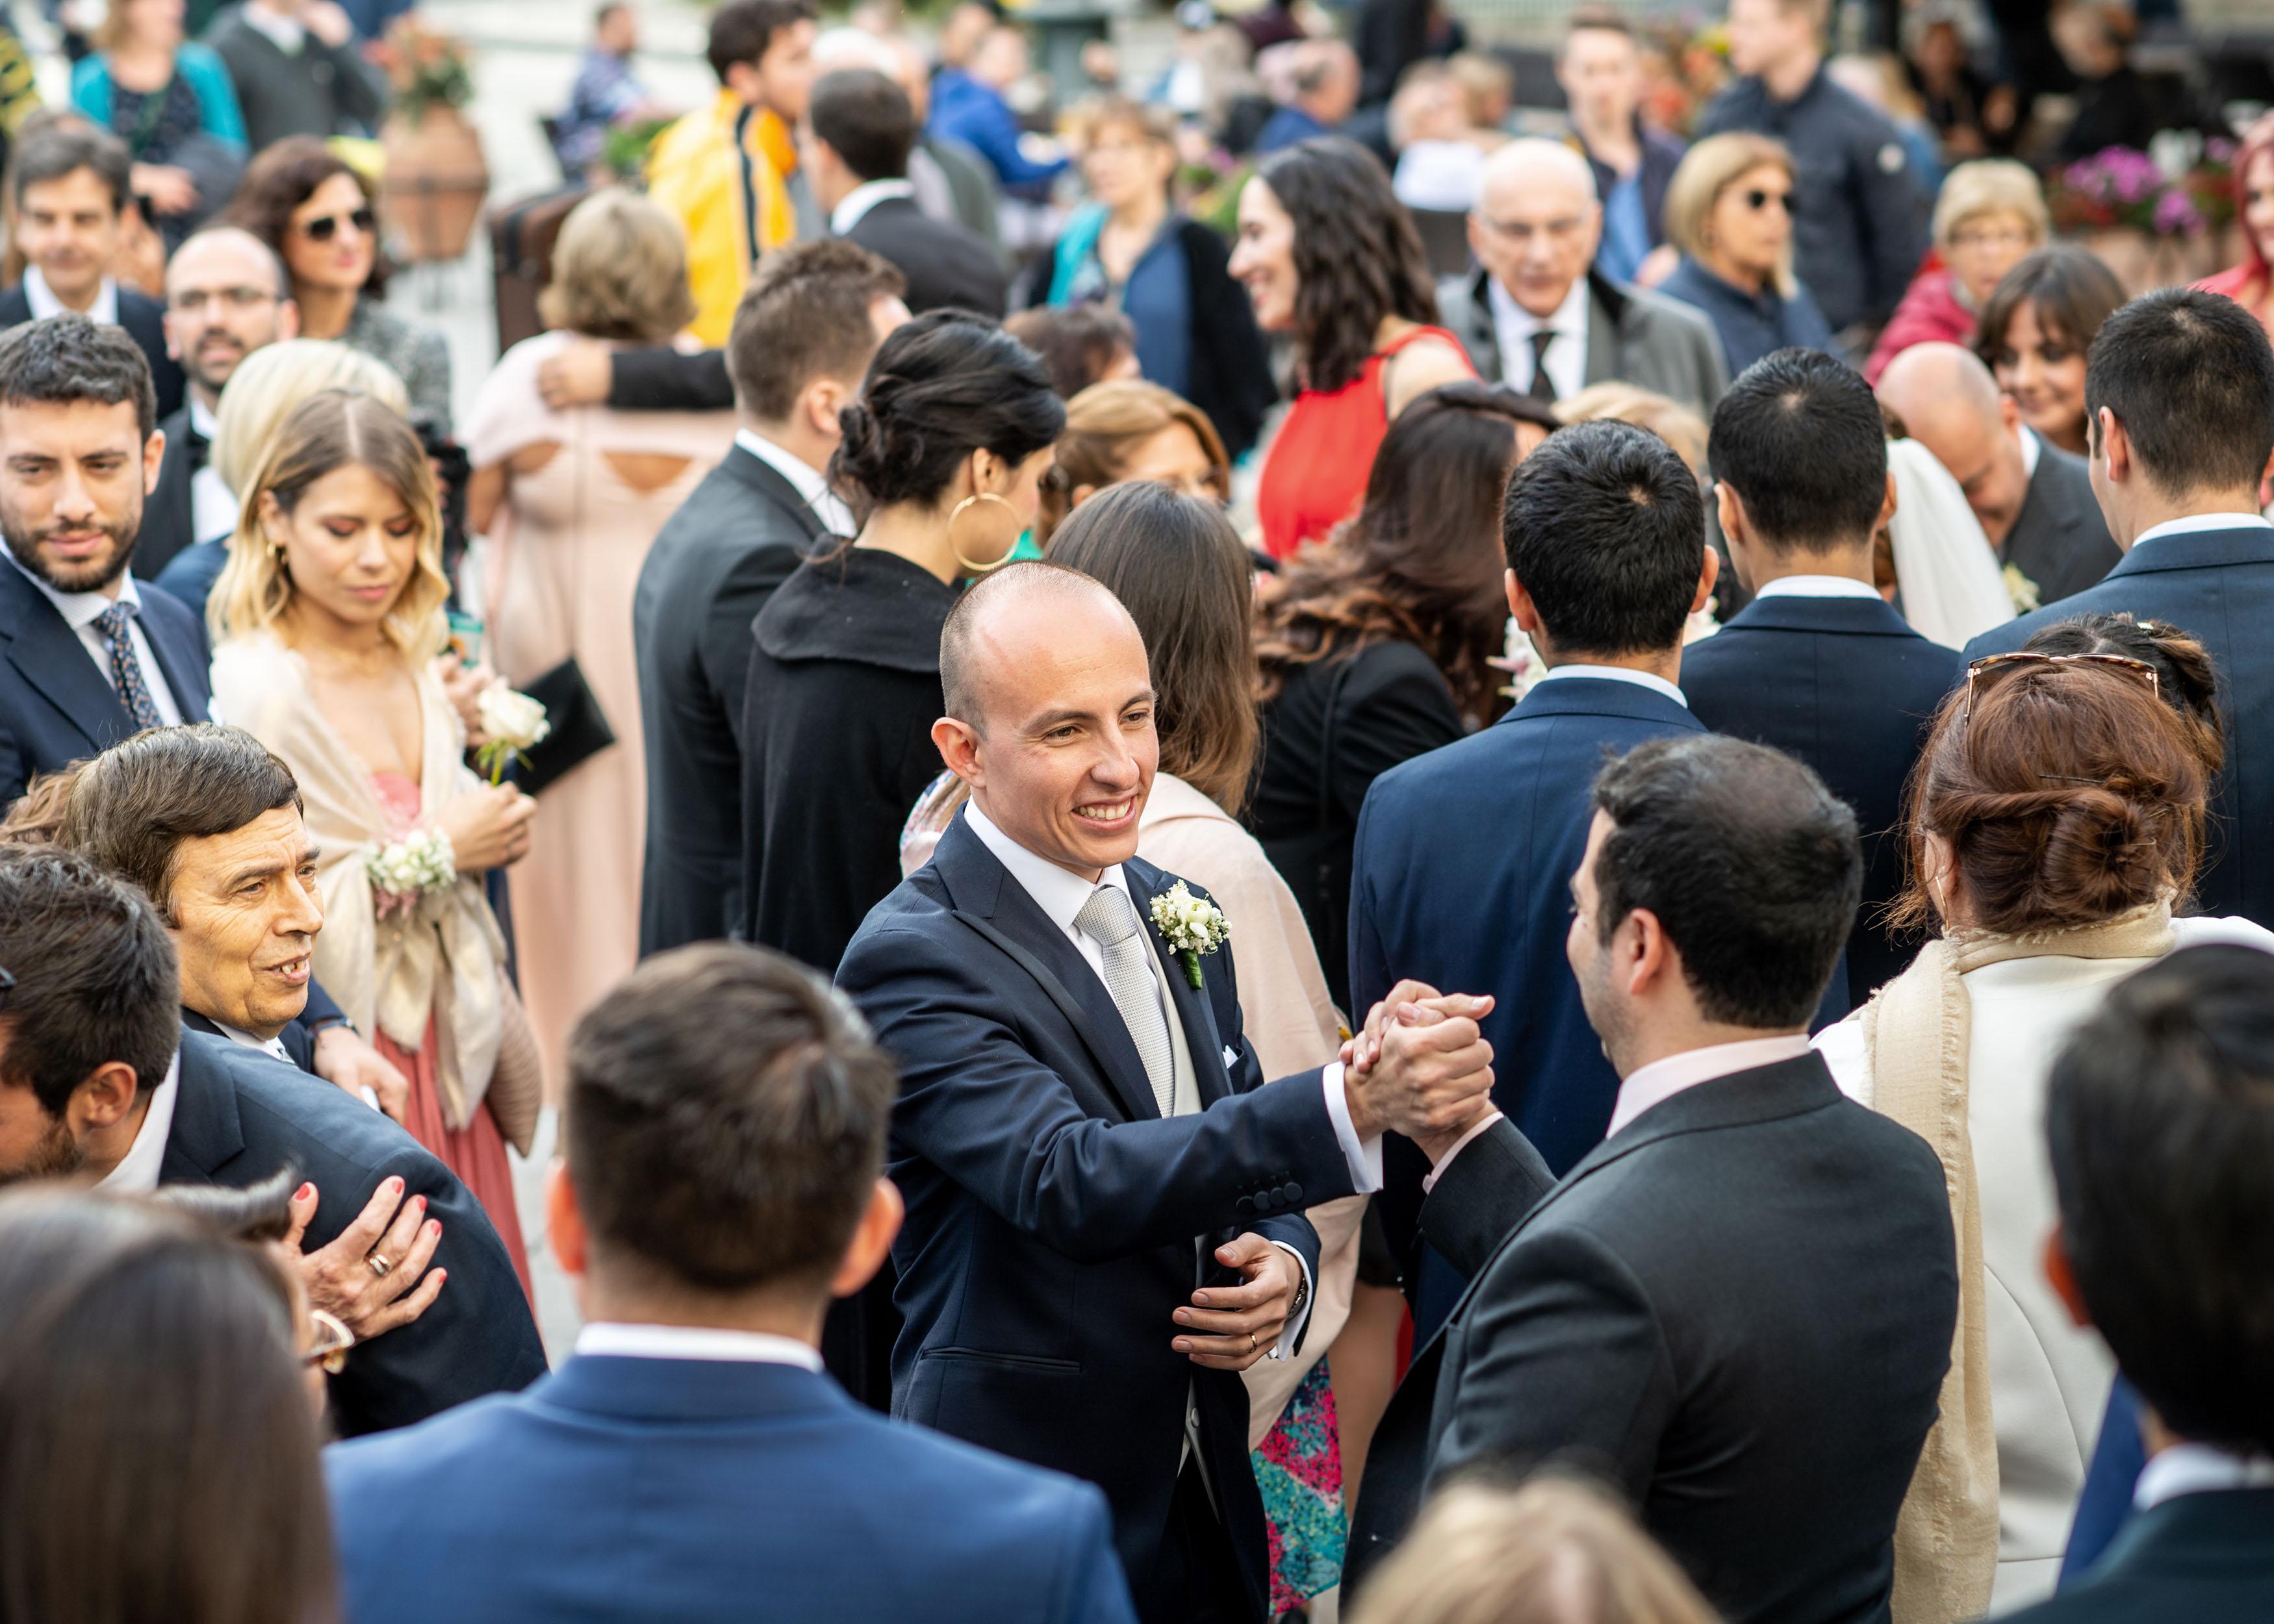 http://www.weddingamalfi.com/wp-content/uploads/Katia-Jorge-18-maggio-2019-30.jpg